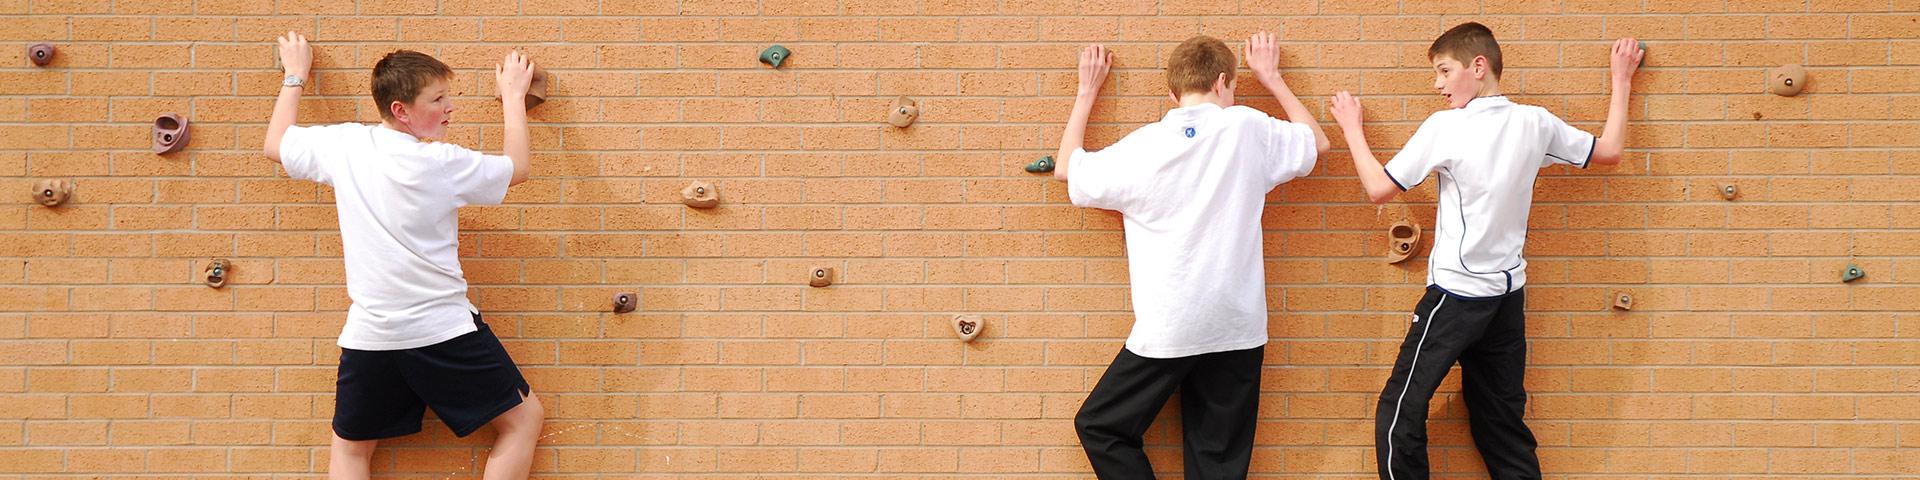 Traverse Climbing Walls for Schools